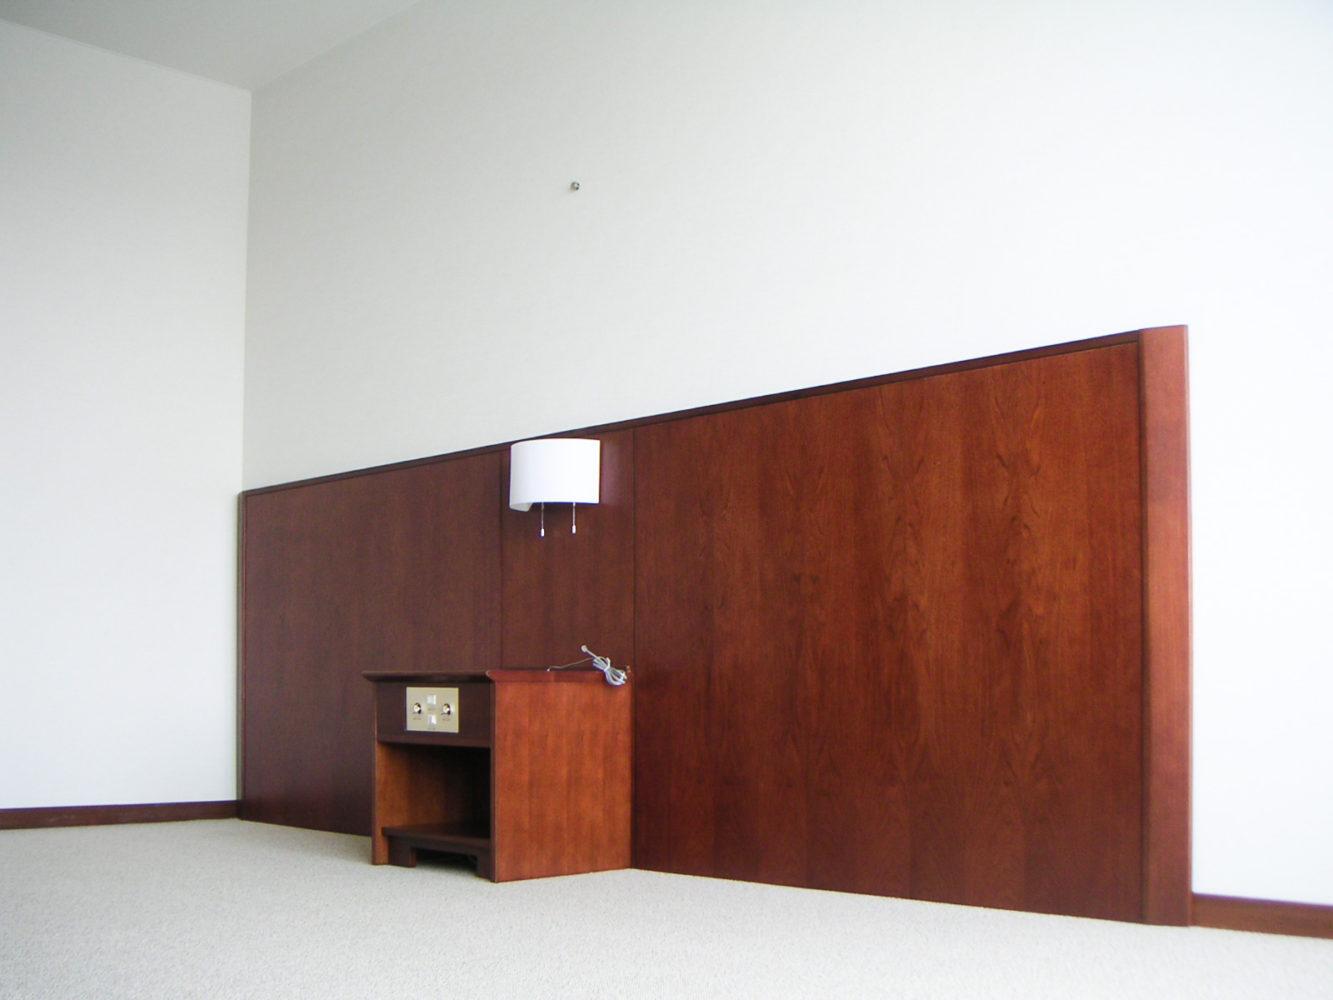 A休養施設